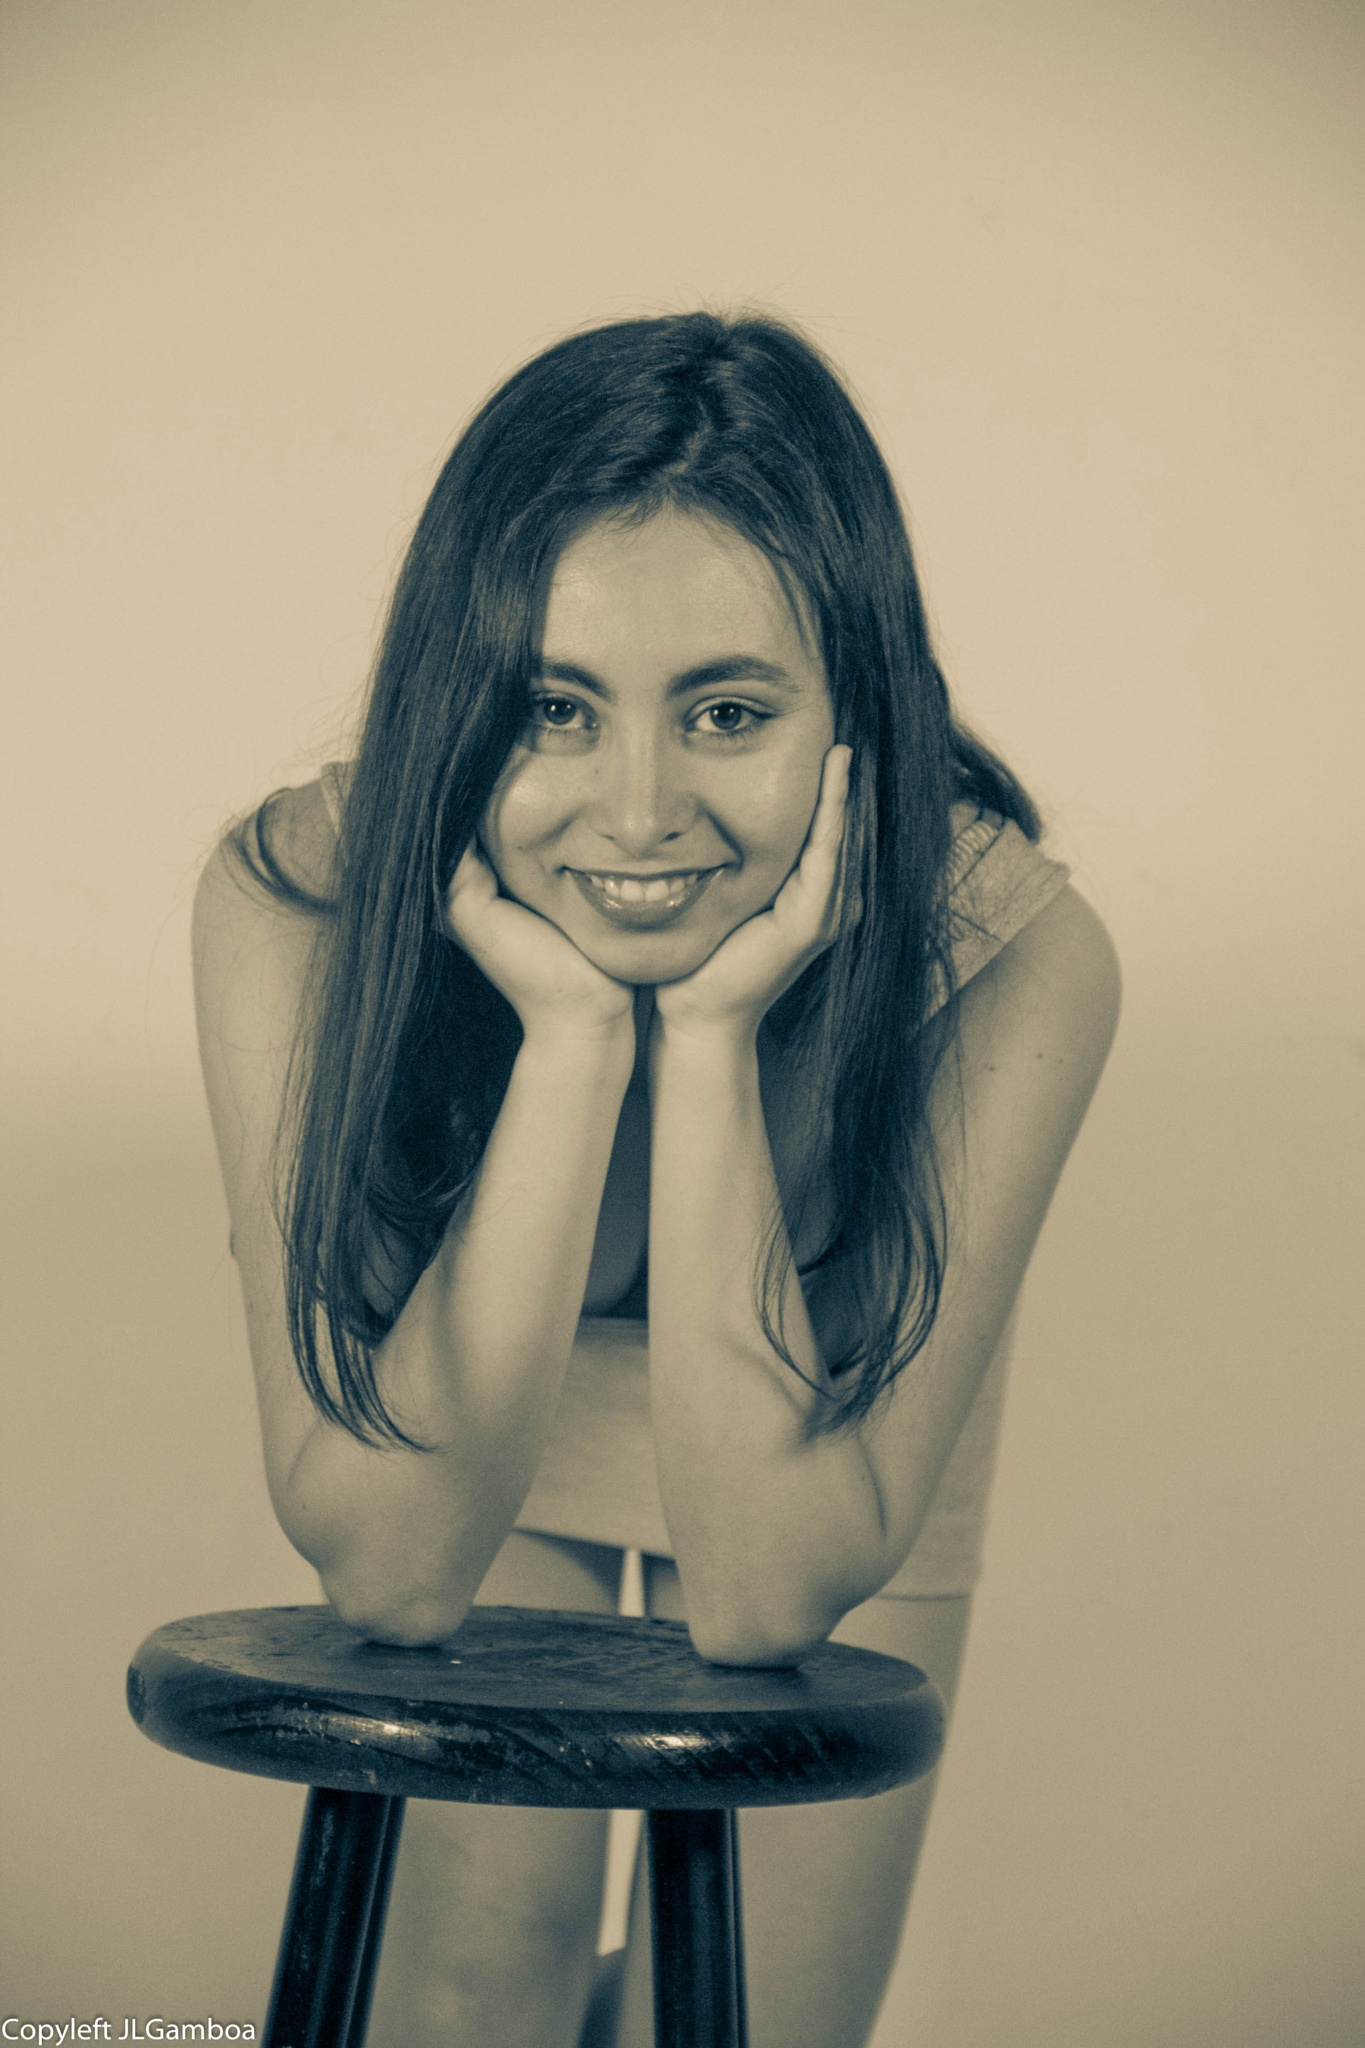 Encantadora sonrisa by Jose Luis Gamboa Urgeles